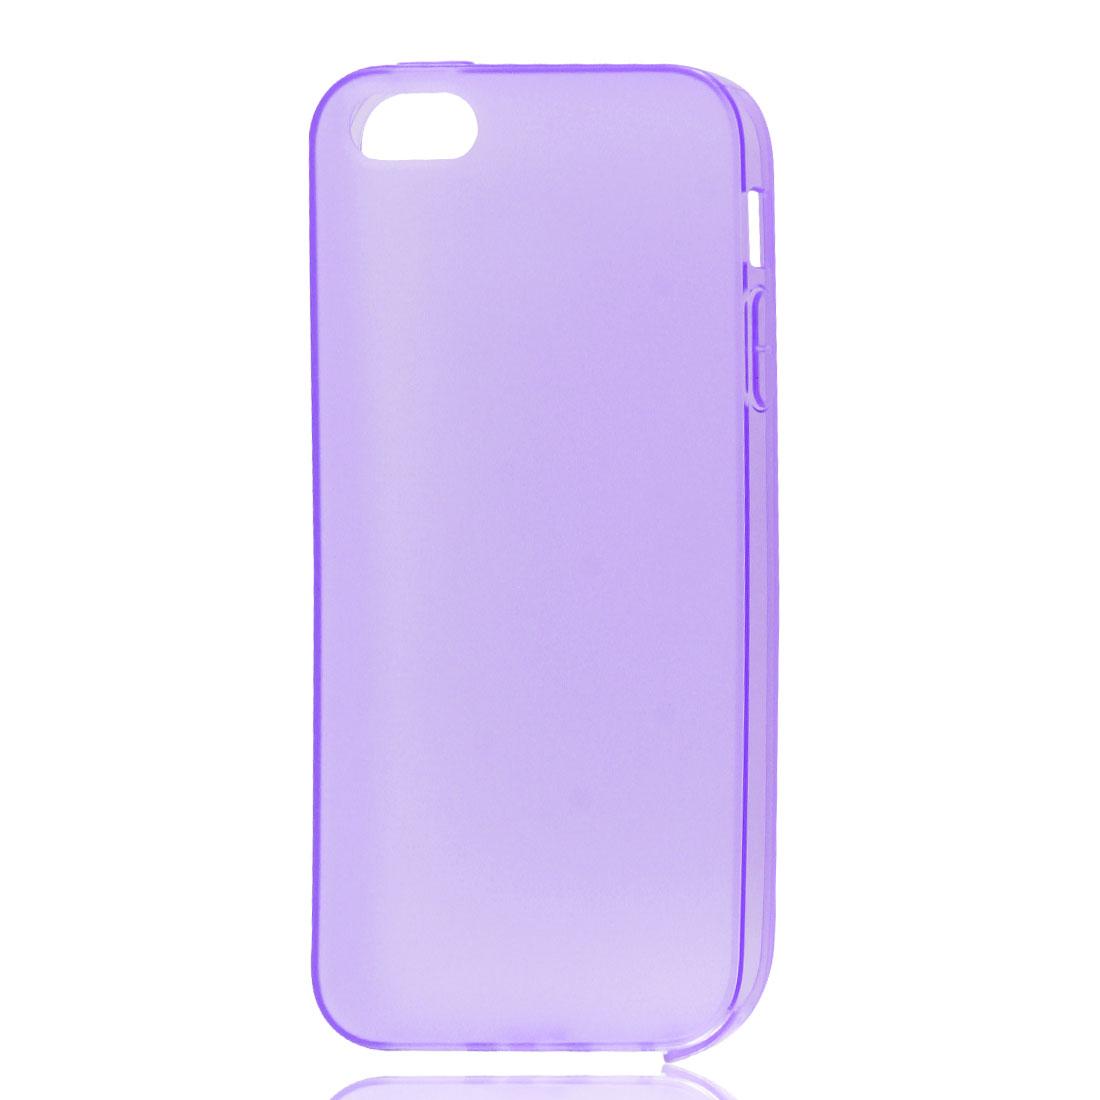 Purple Soft Plastic Matte Protective Case Cover Skin for Apple iPhone 5 5G - image 1 de 1